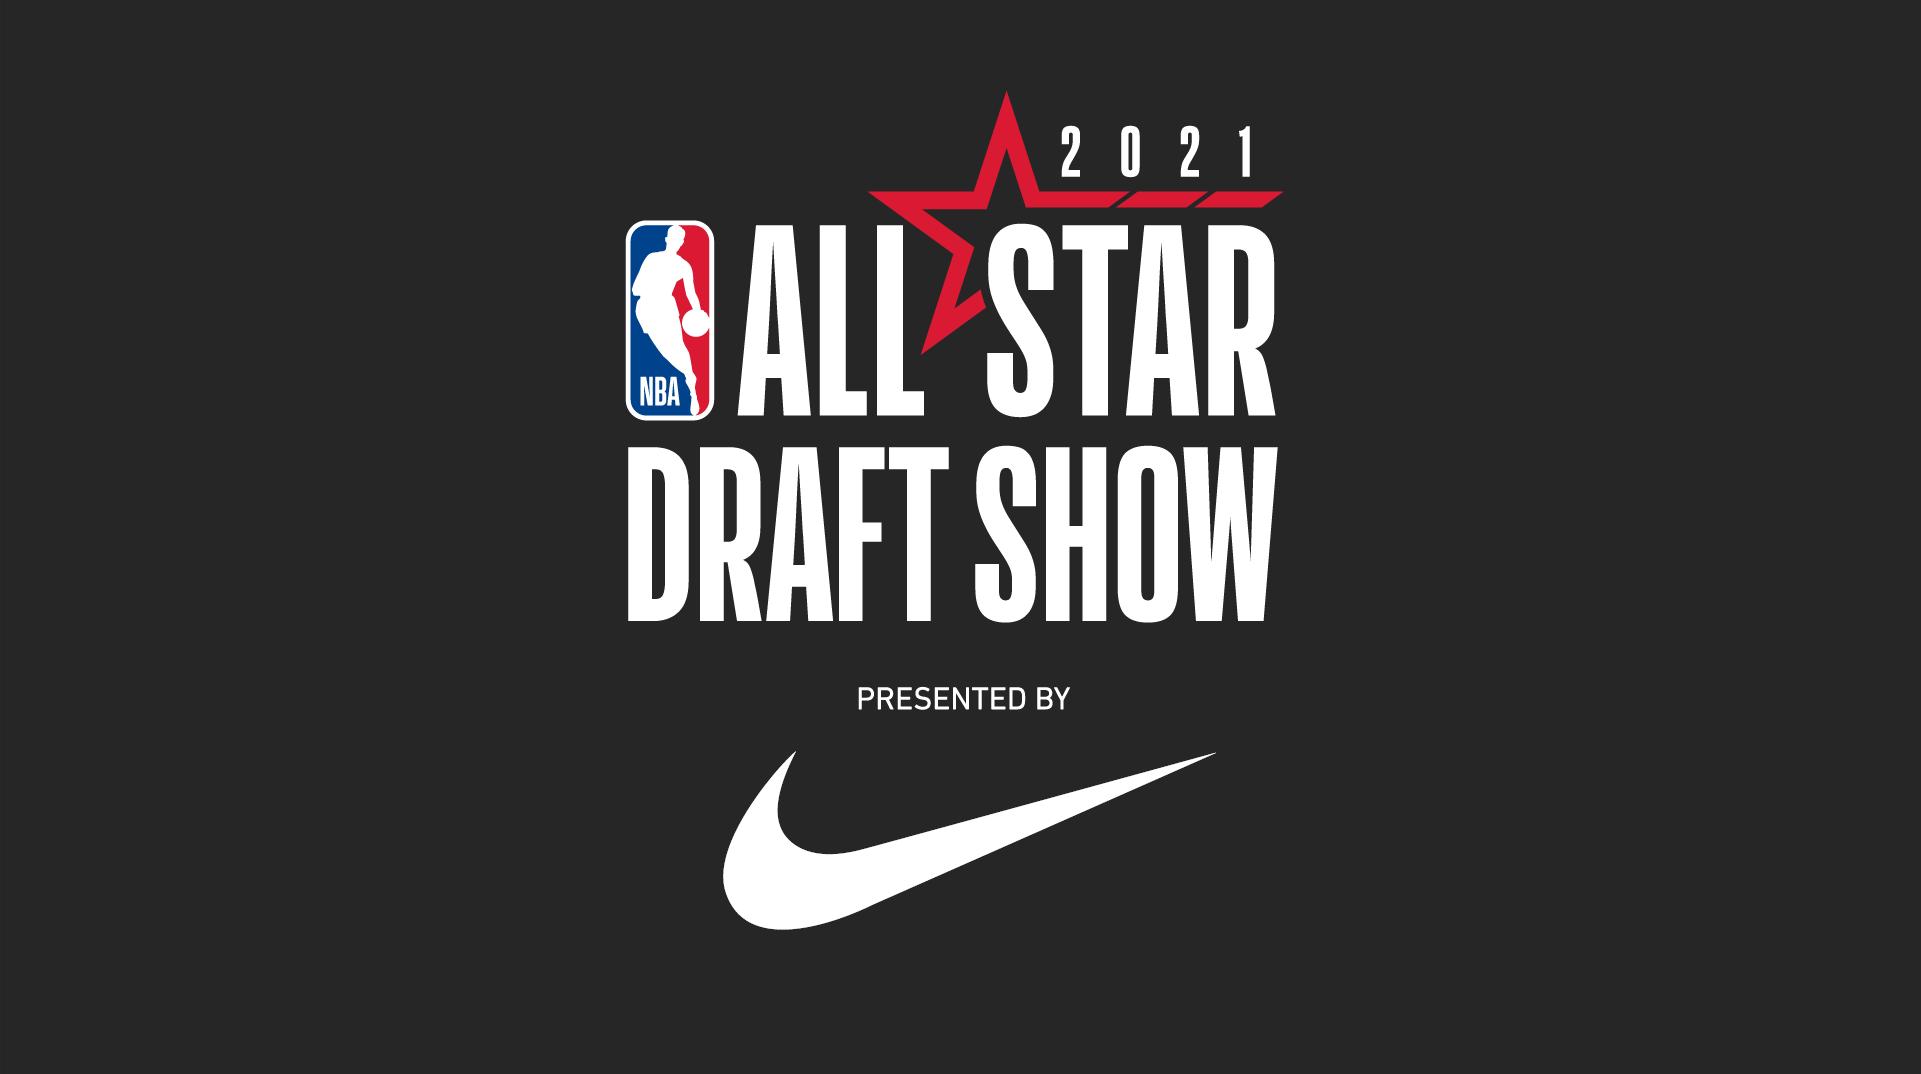 NBA All-Star Draft Show